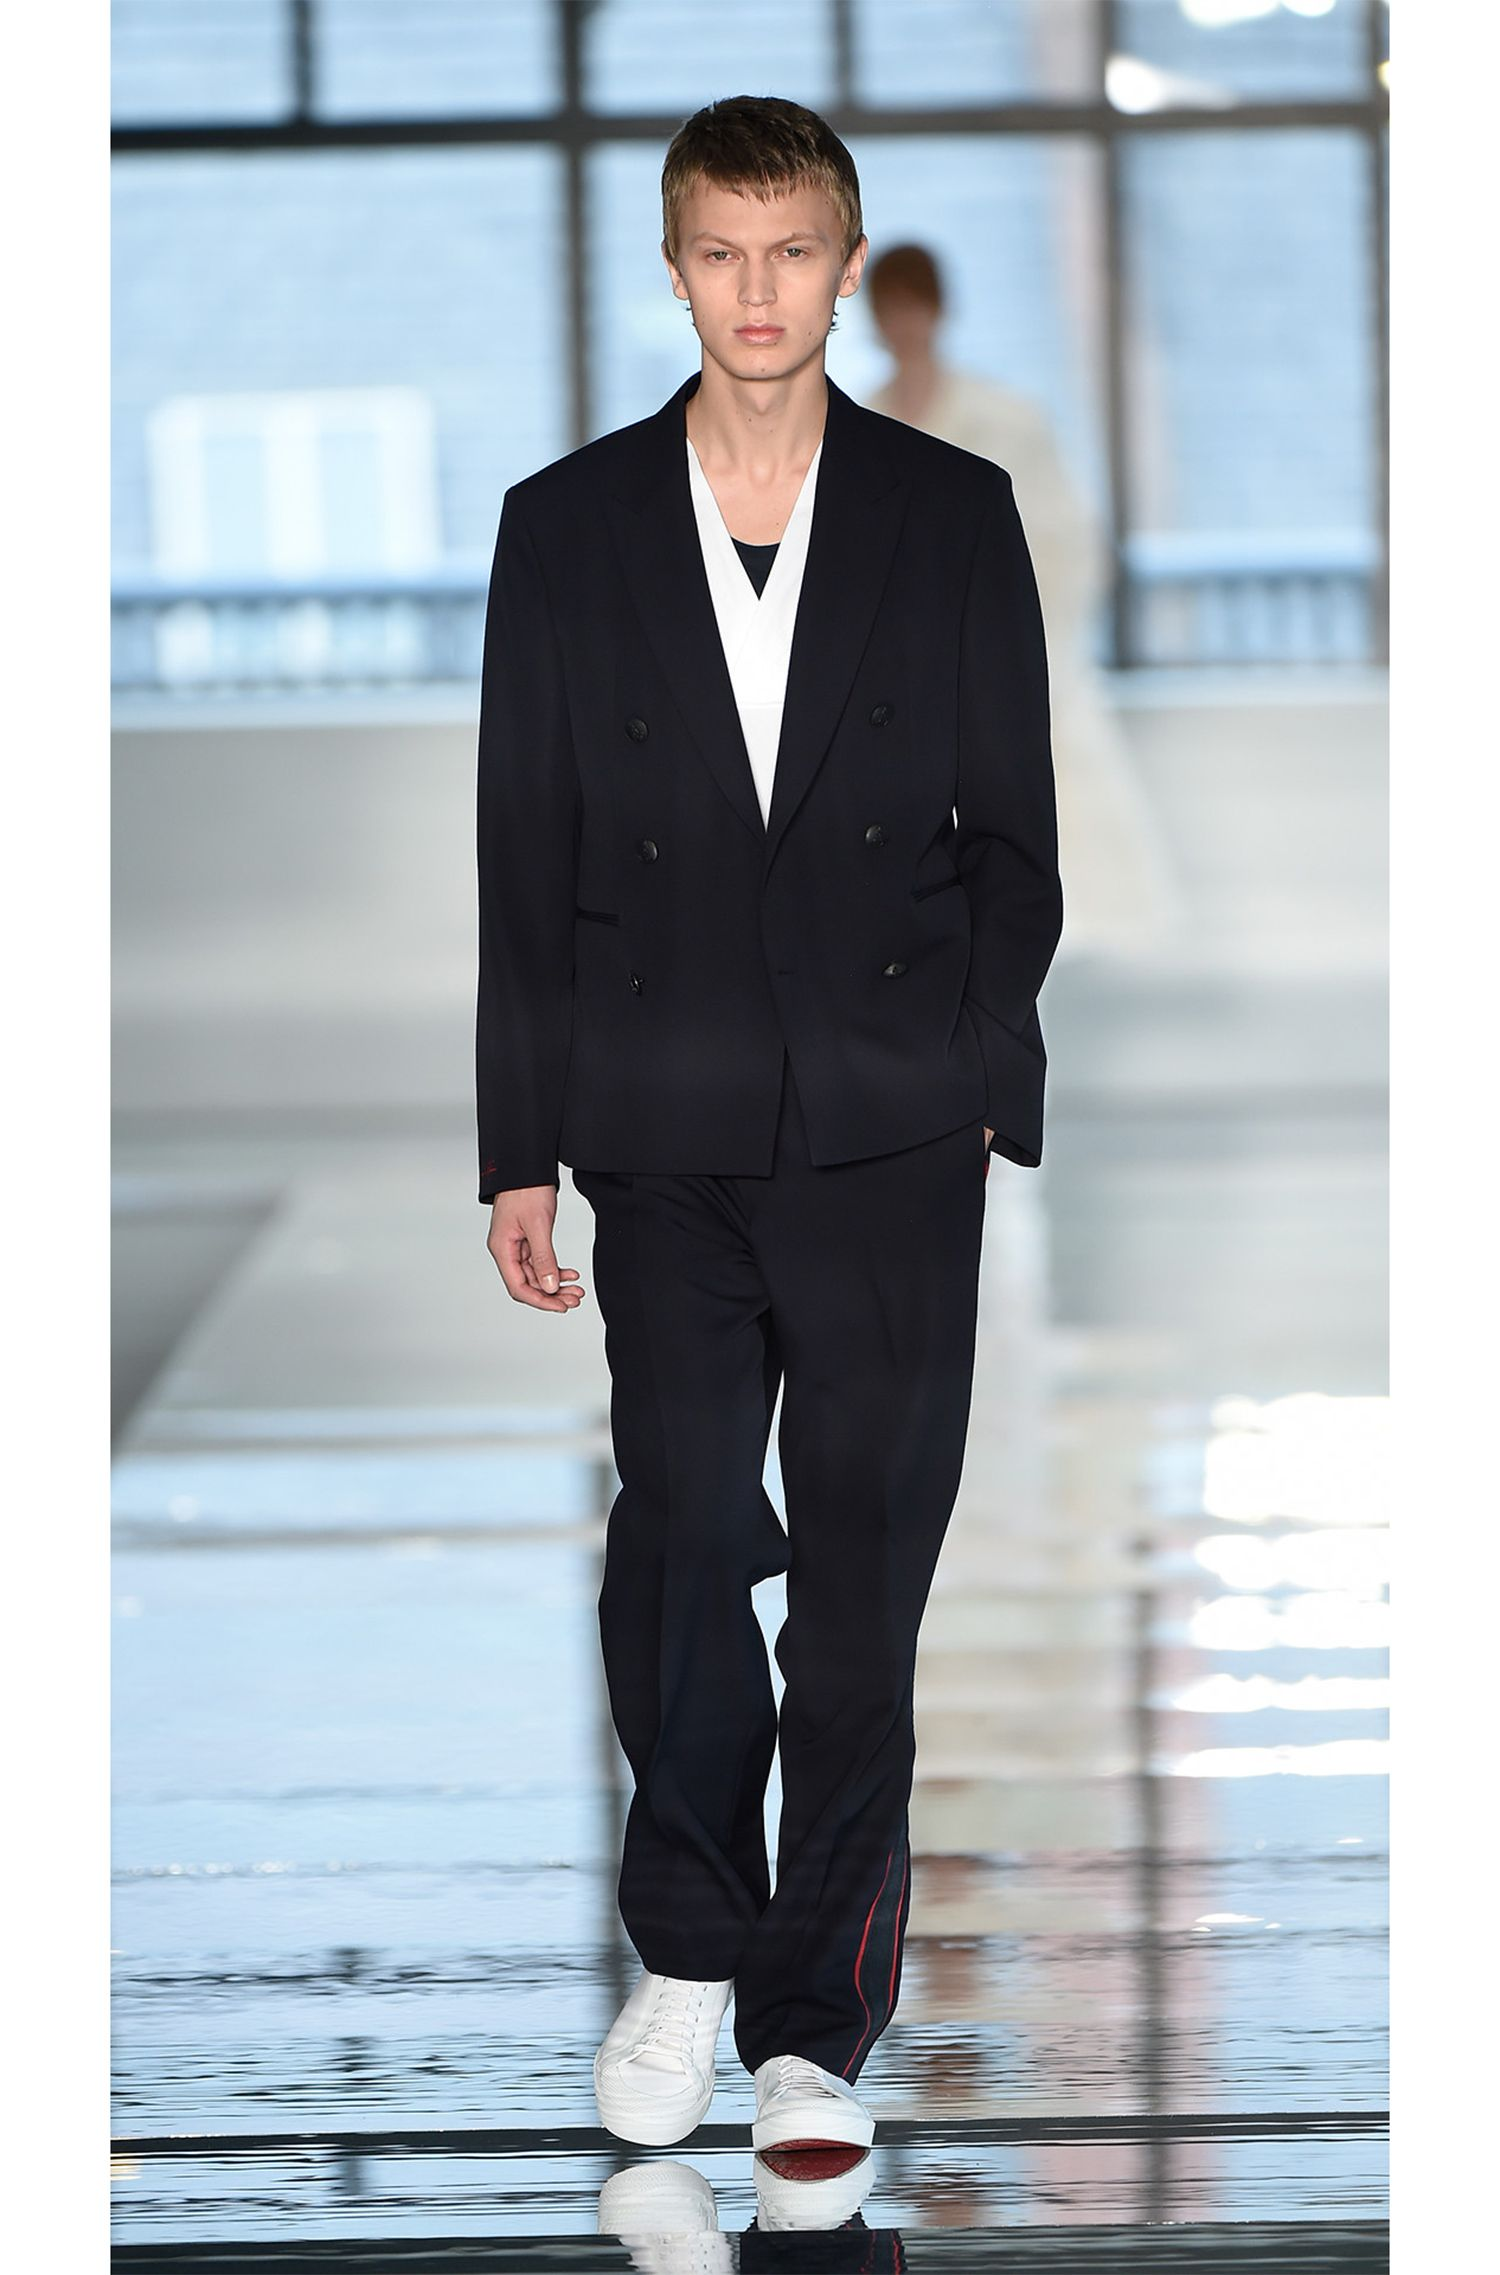 Pantaloni in lana vergine Runway Edition con cucitura laterale nastrata